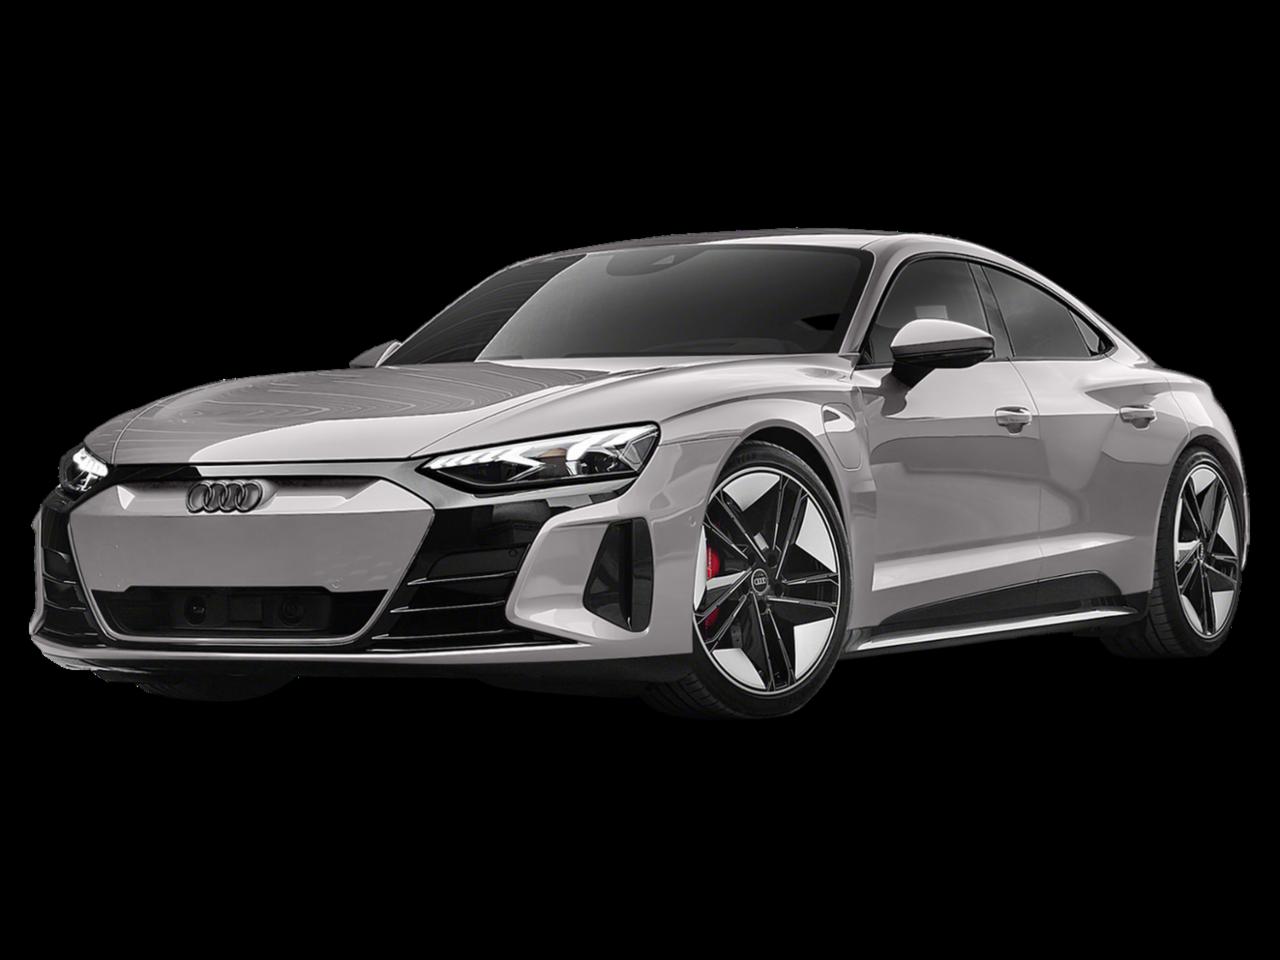 Audi 2022 RS e-tron GT quattro